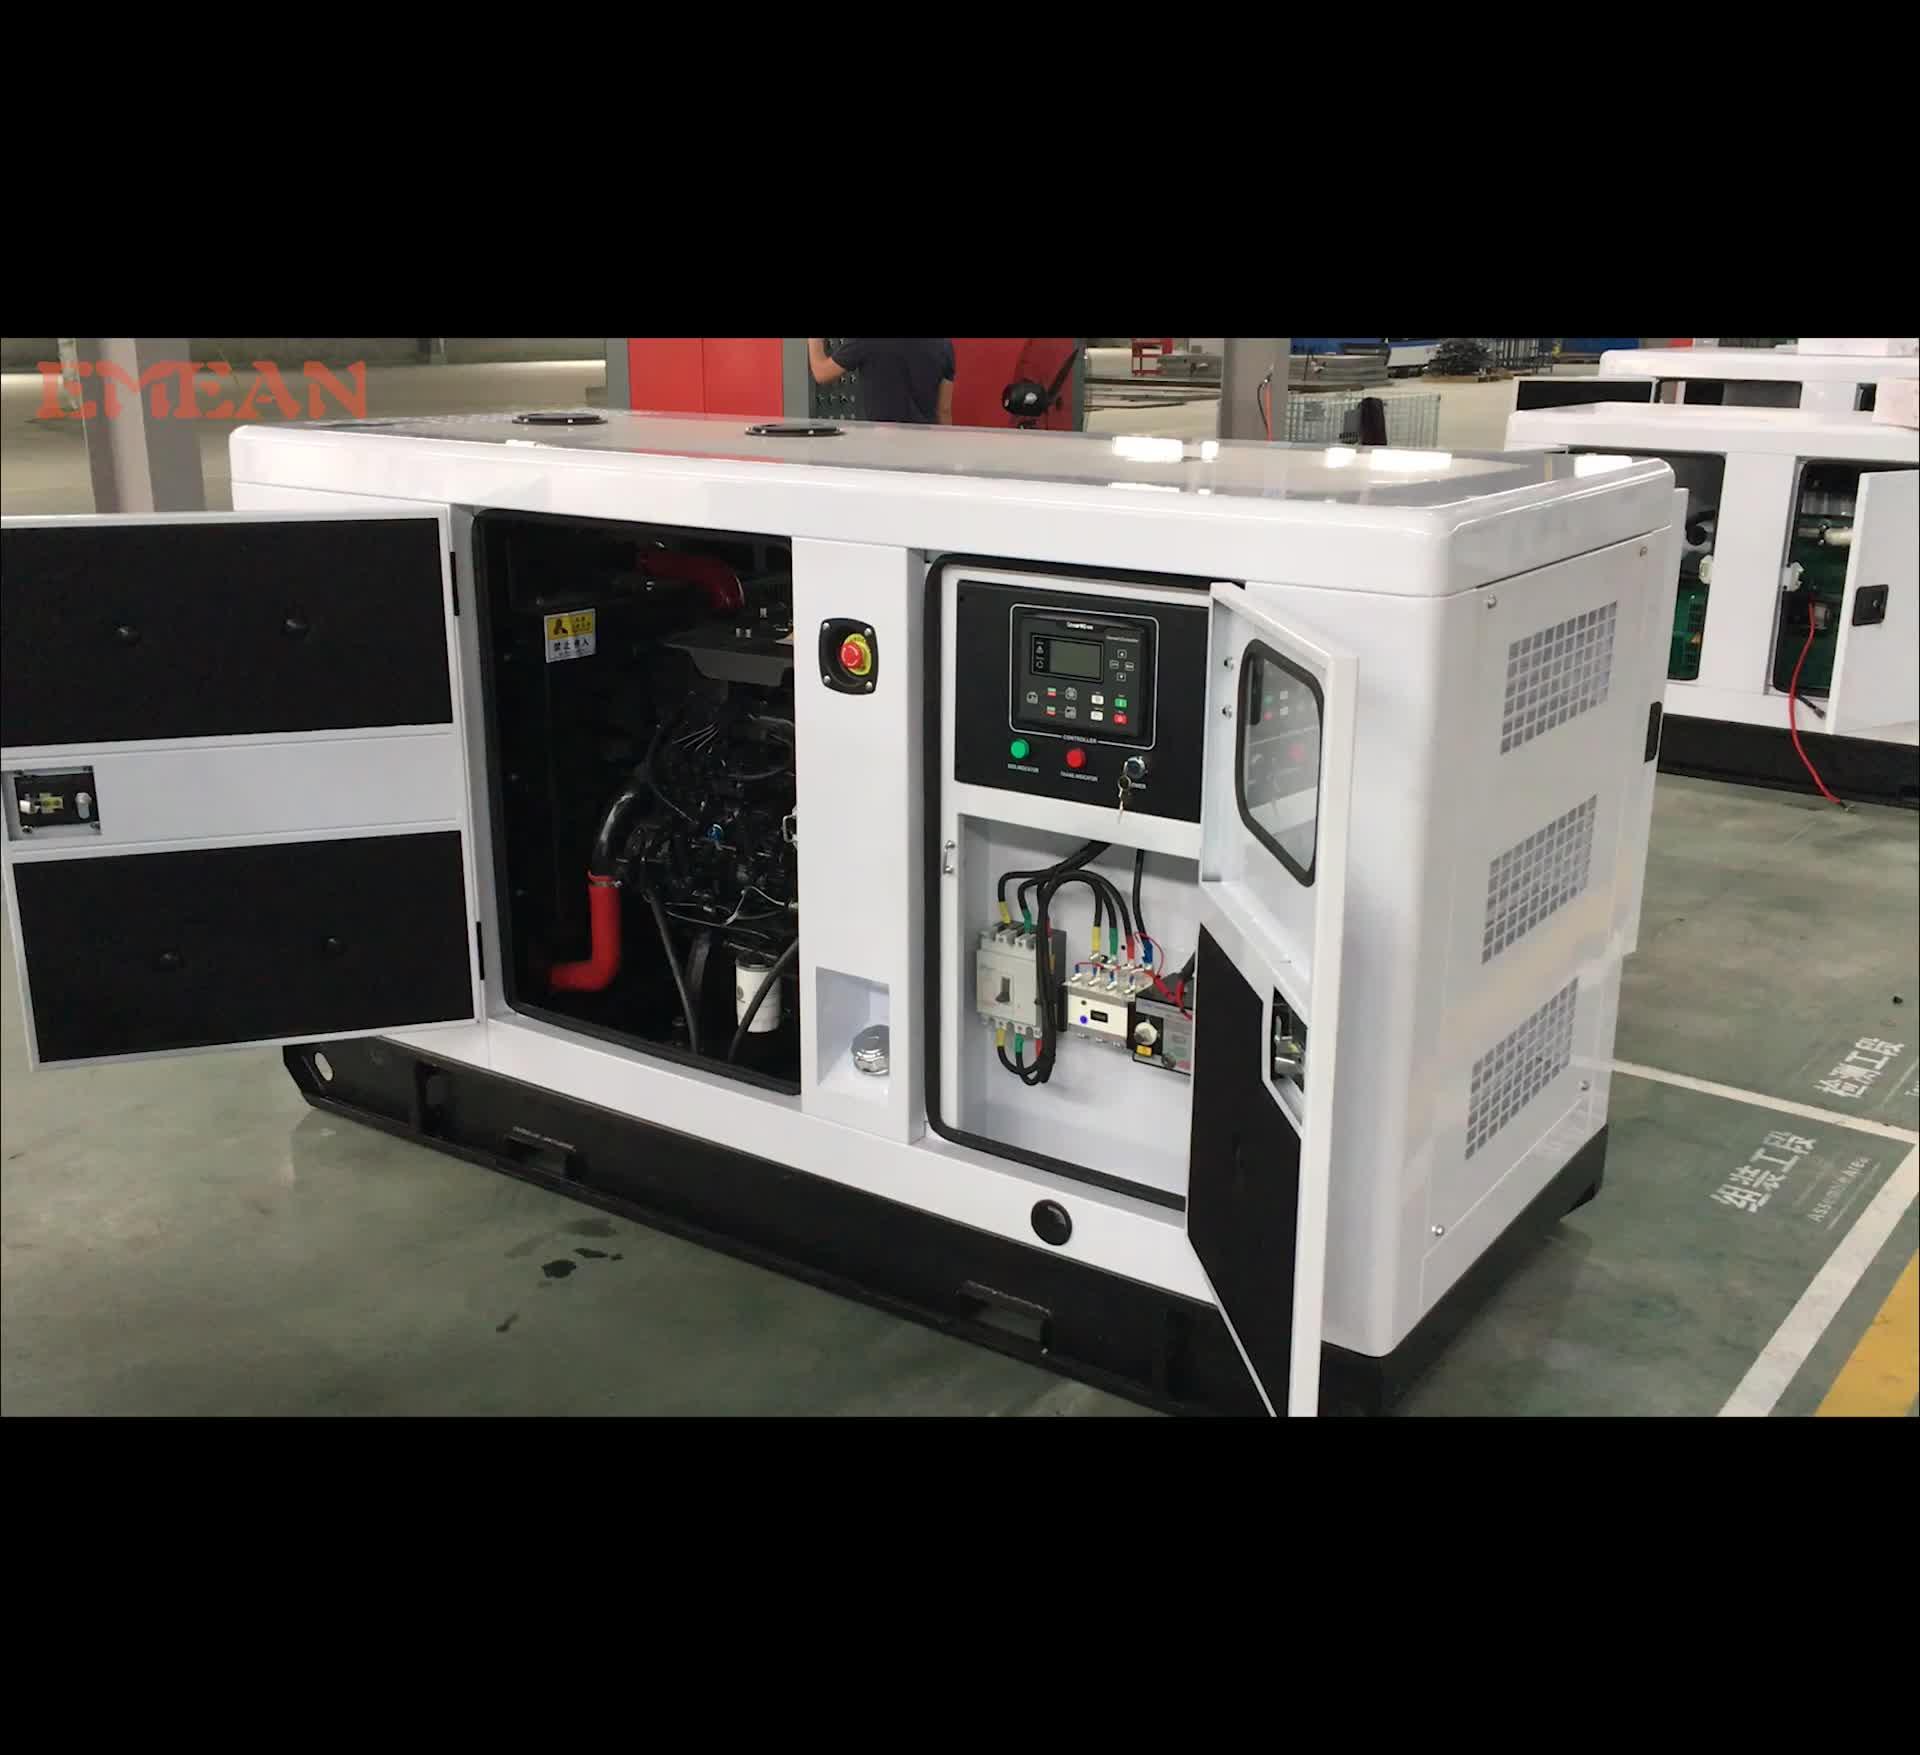 soundproof cheap 40kw/50kva  generators for sale 40kw/50kva diesel generator set